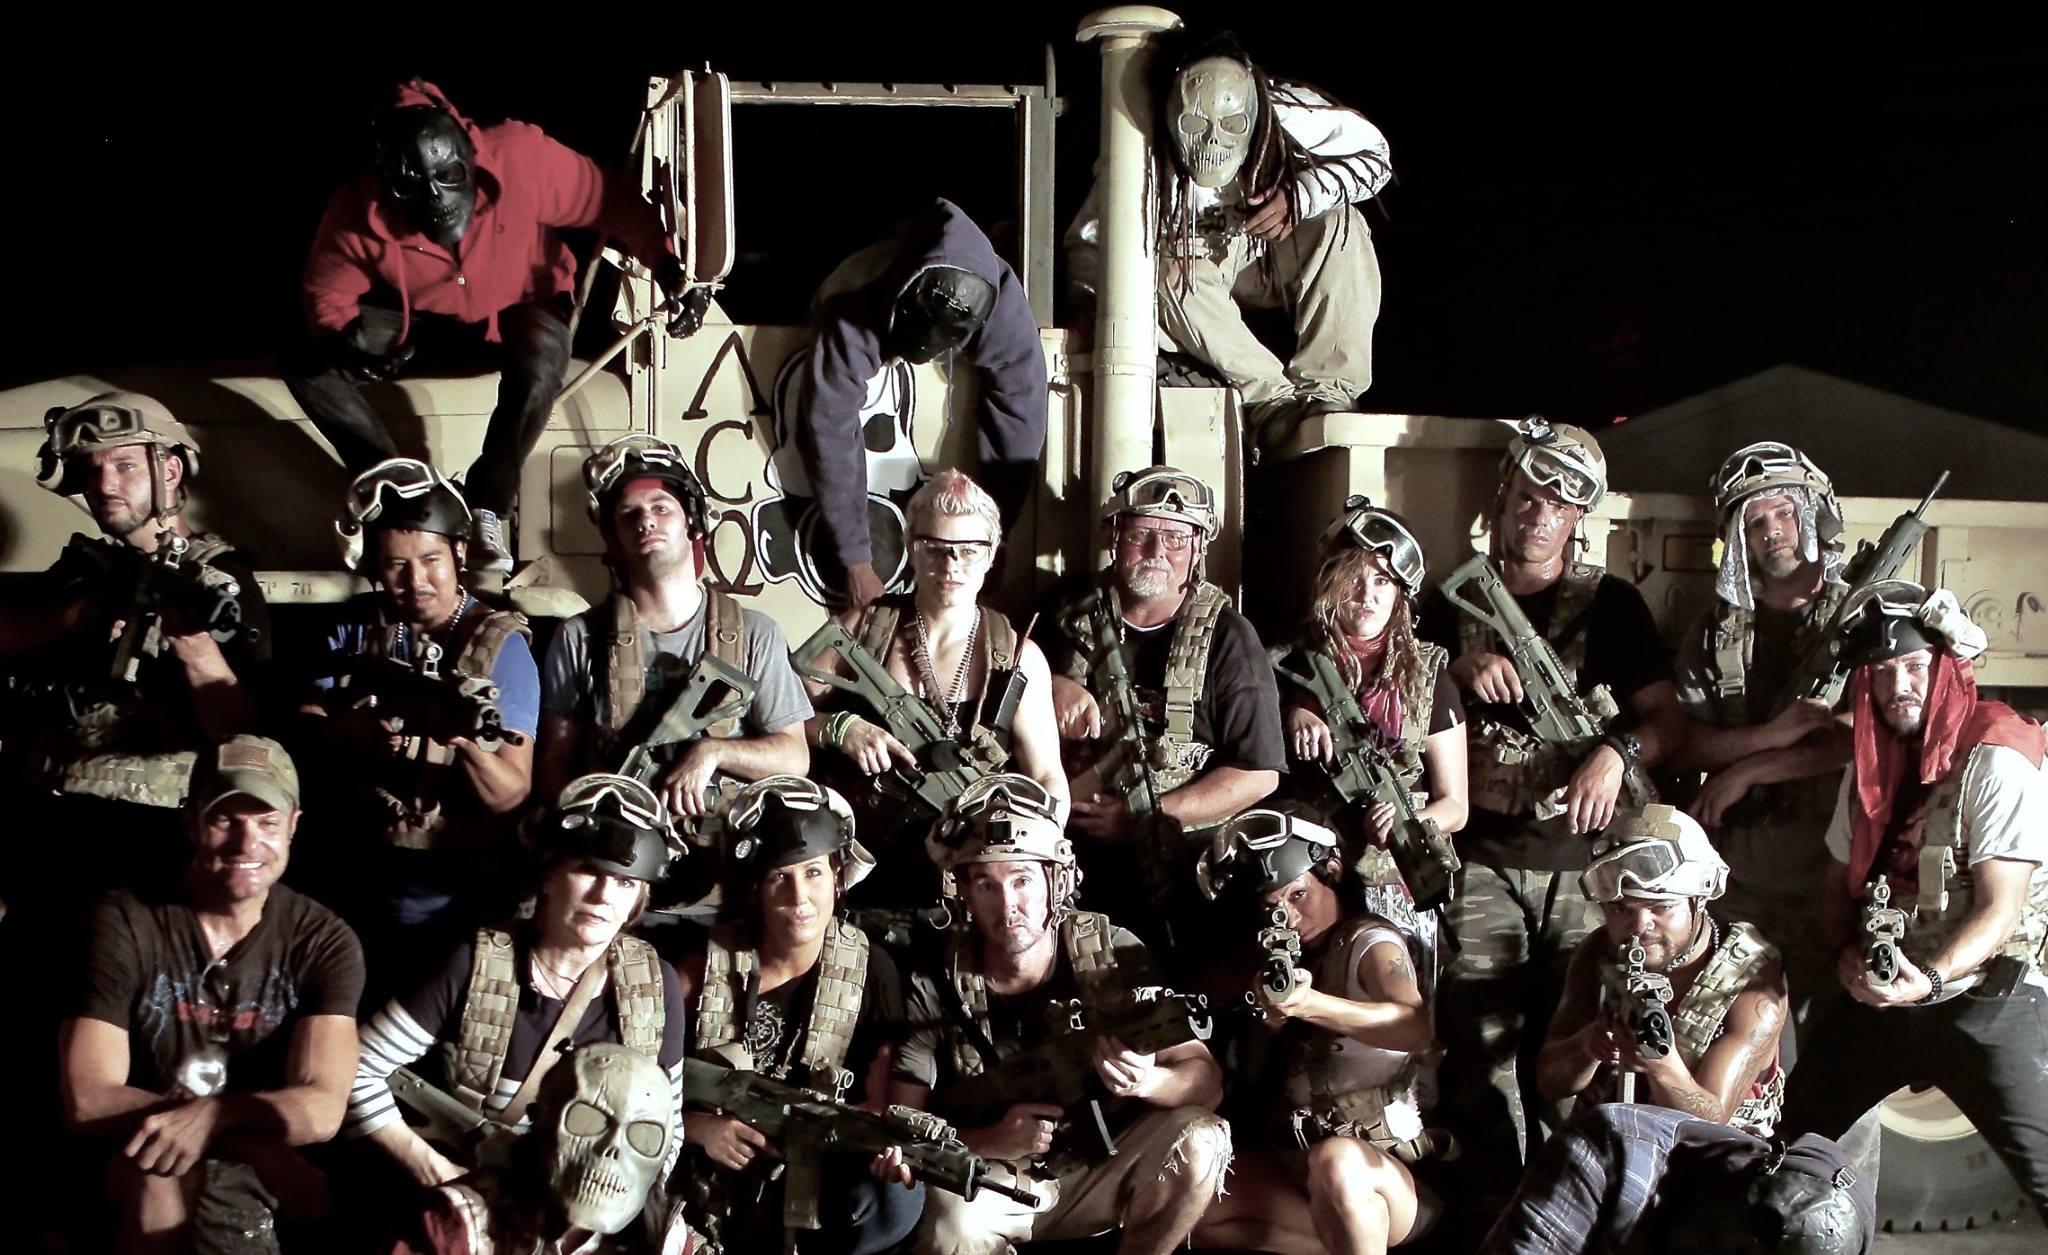 Adventure Combat Ops is a Vegaster TOP Pick for Adrenaline Activity